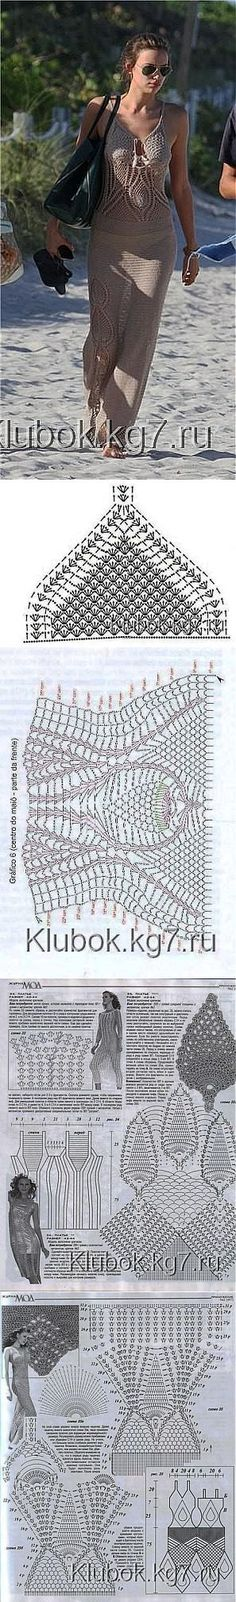 "Пляжное платье [   ""Posts on the topic of crochet added by Celeste Fernandes"" ] #<br/> # #Bikini #Cover #Up,<br/> # #Crochet #Dresses,<br/> # #Bikinis,<br/> # #Crochet,<br/> # #Blouses,<br/> # #Beach<br/>"